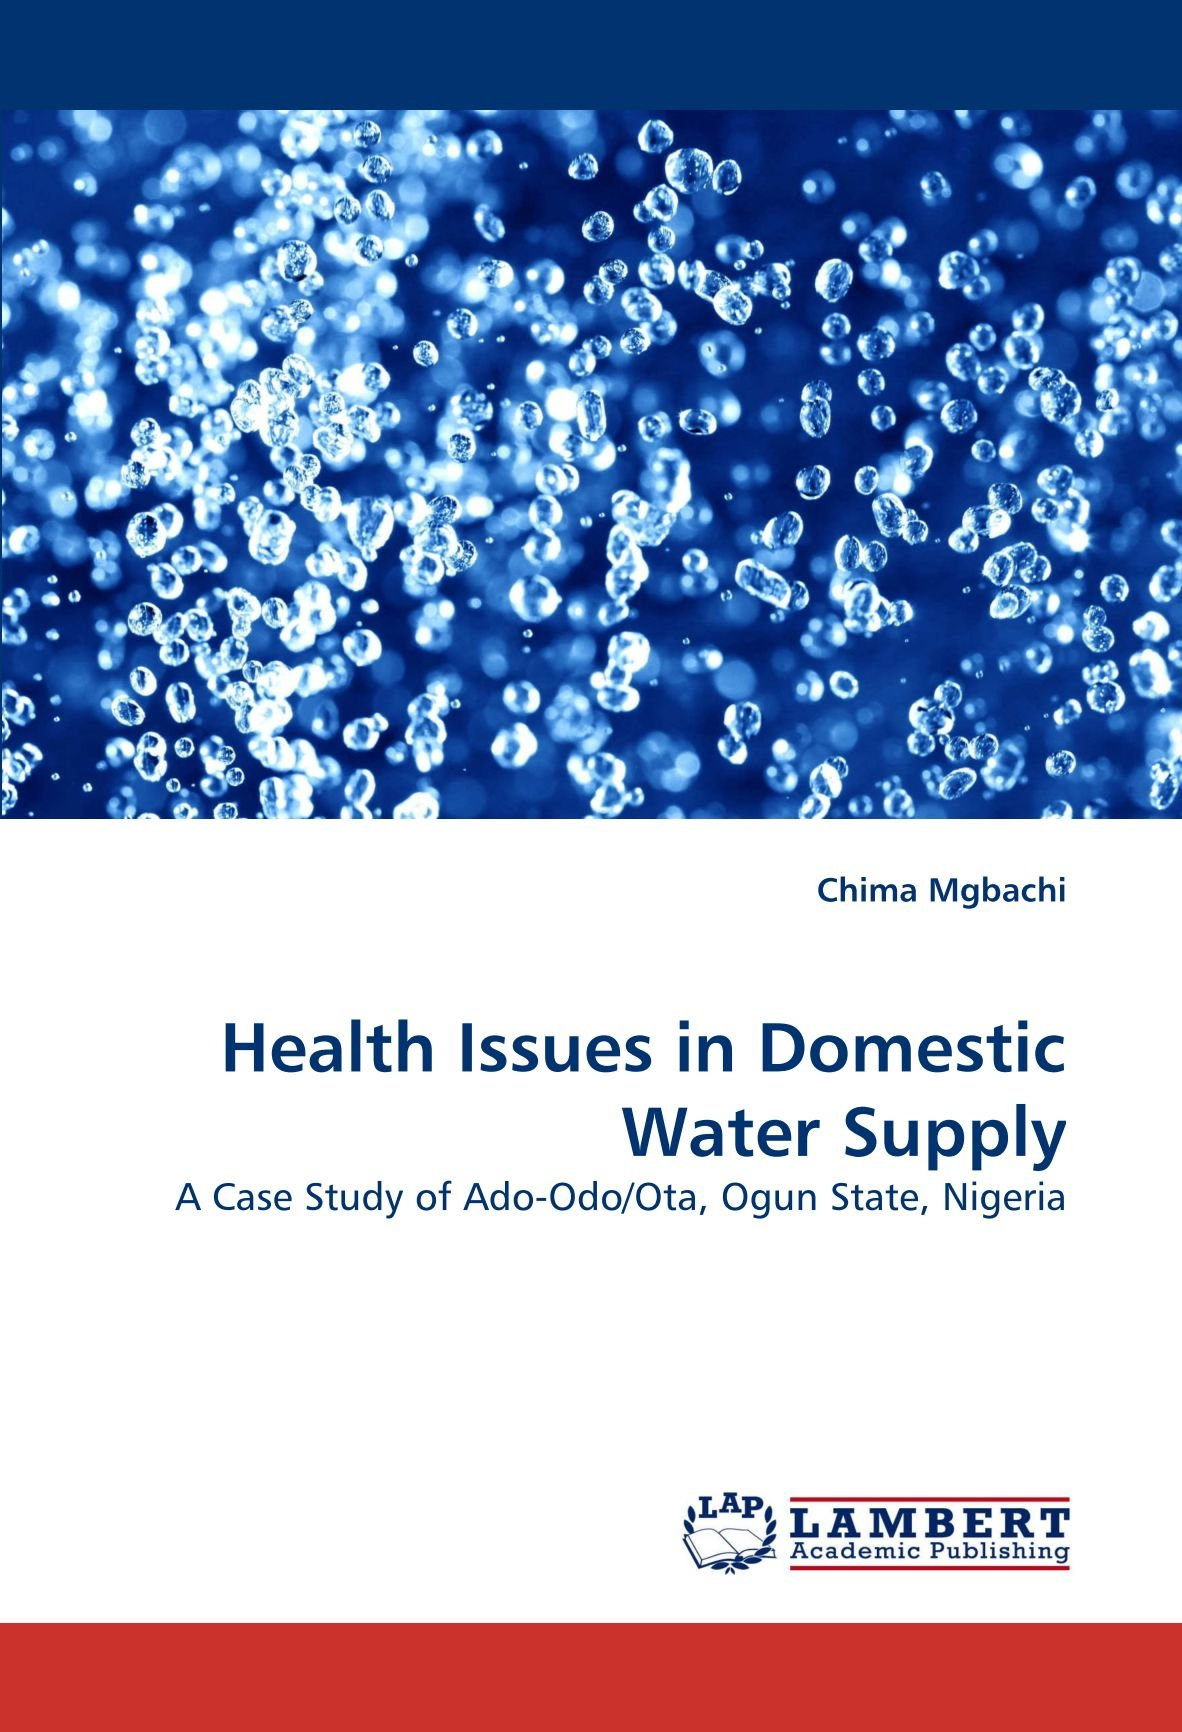 Health Issues In Domestic Water Supply A Case Study Of Ado Odo Ota Ogun State Nigeria Mgbachi Chima 9783843377287 Amazon Com Books